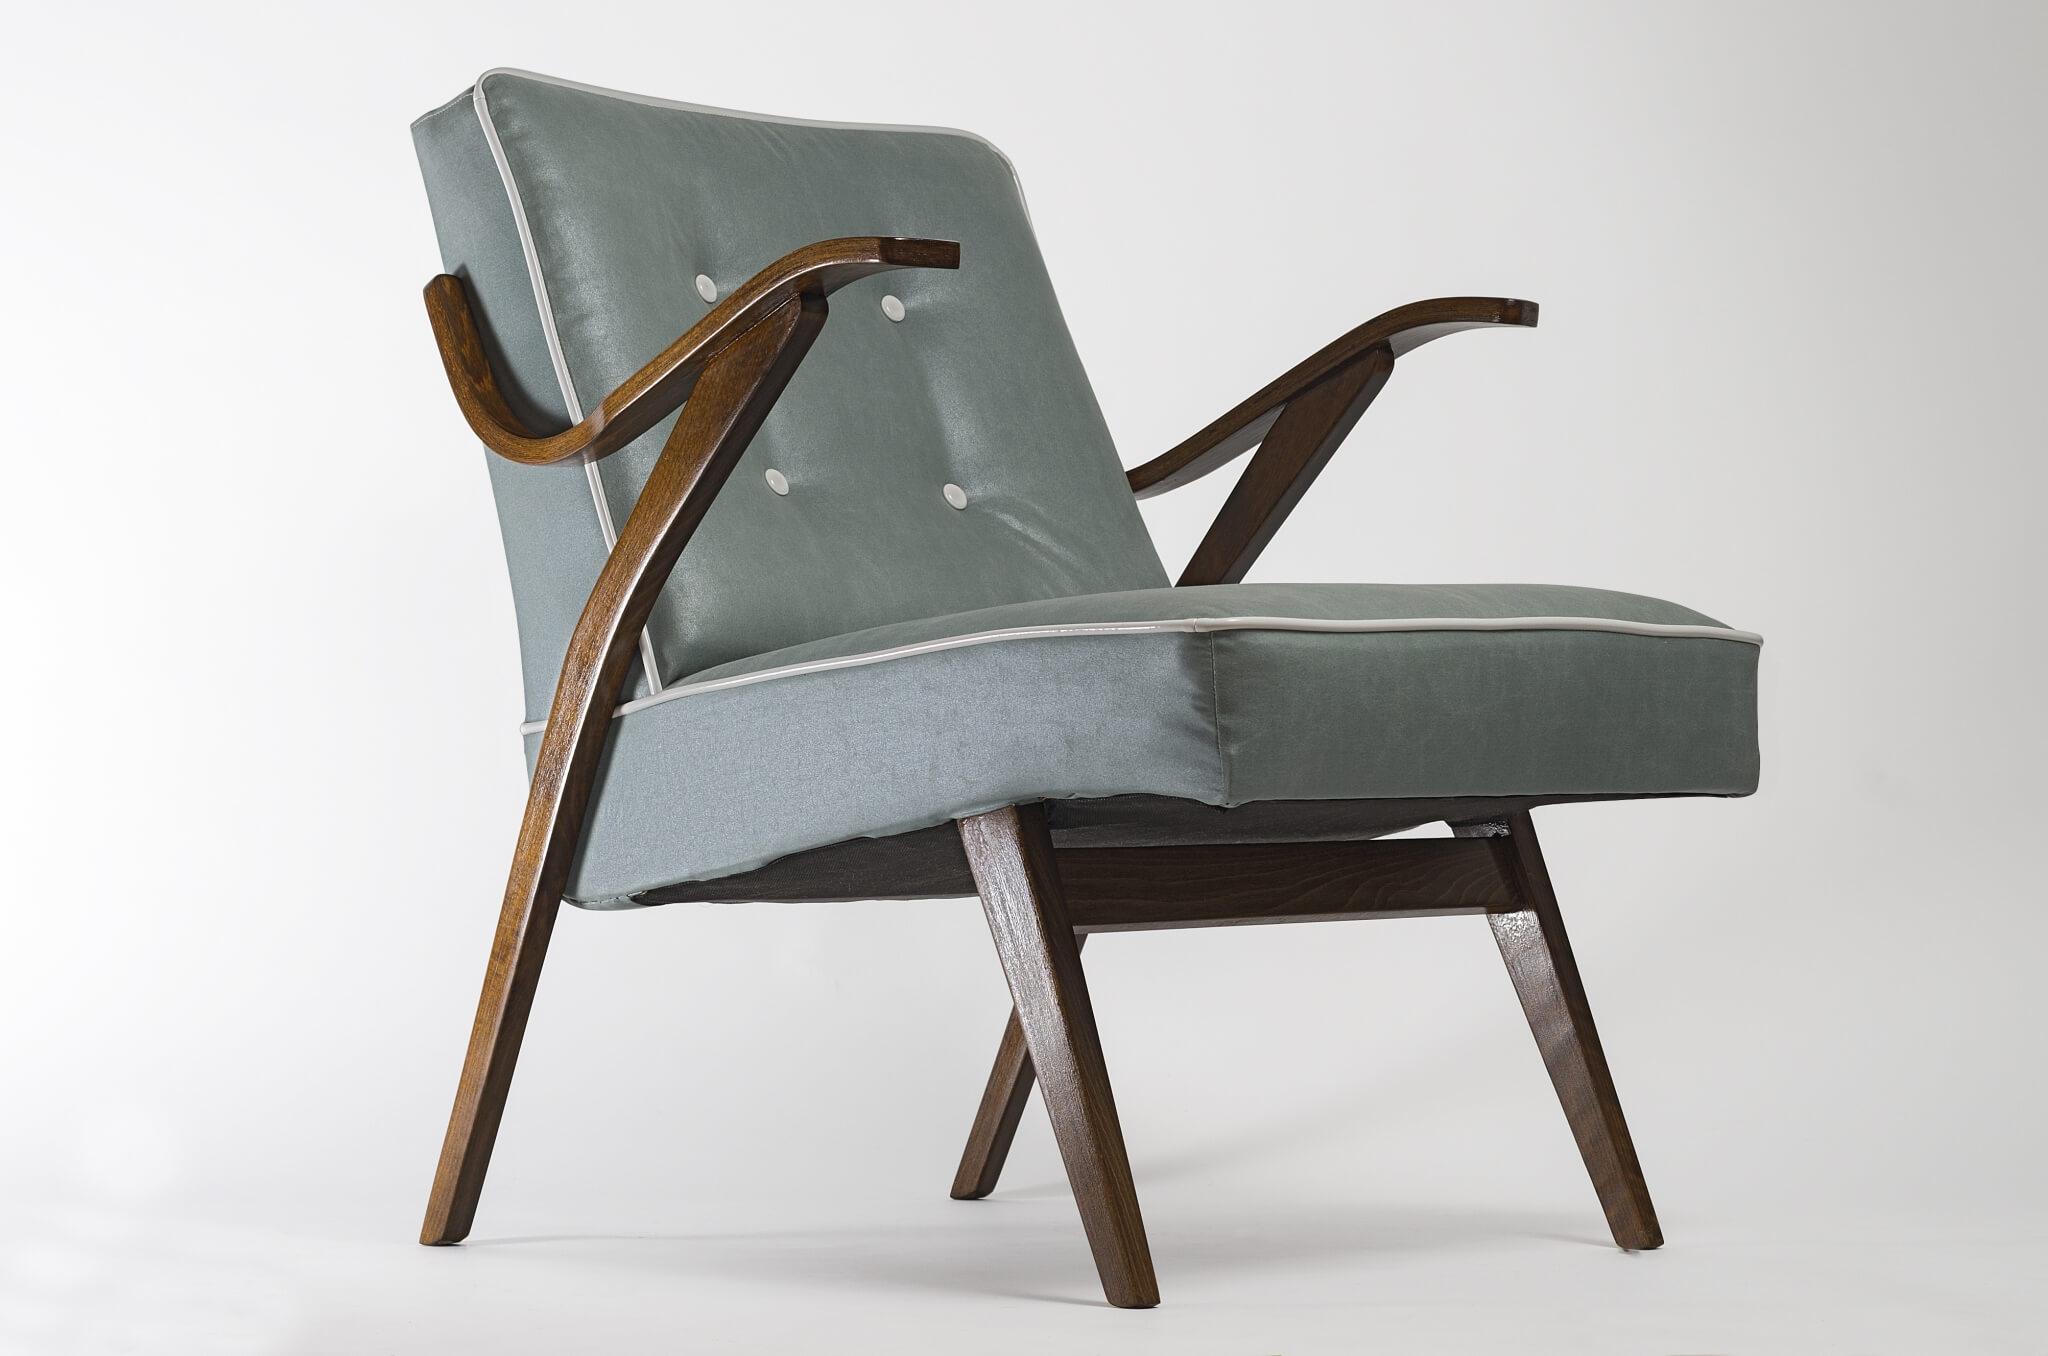 Exceptionnel Homeu003eMid Century Modernu003eRestored Turquoise MCM Armchair From 1960u0027s